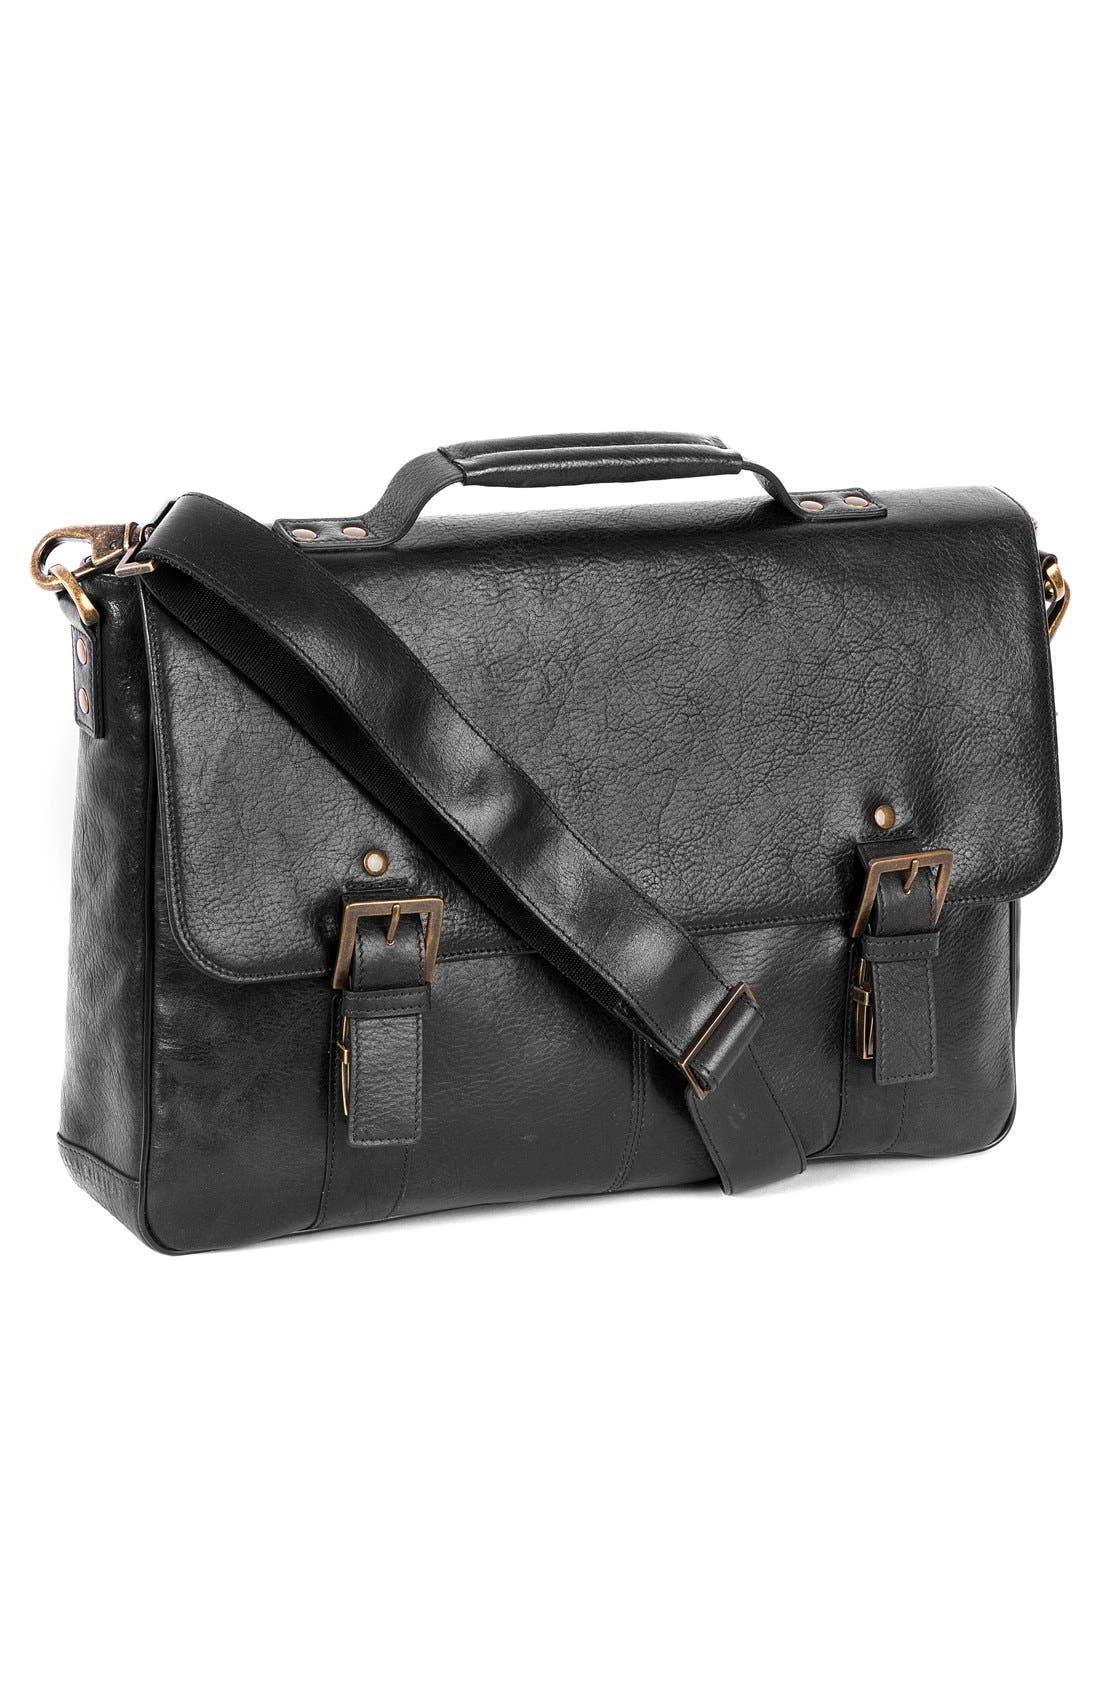 'Becker' Leather Messenger Bag,                             Alternate thumbnail 5, color,                             BLACK W/ KHAKI